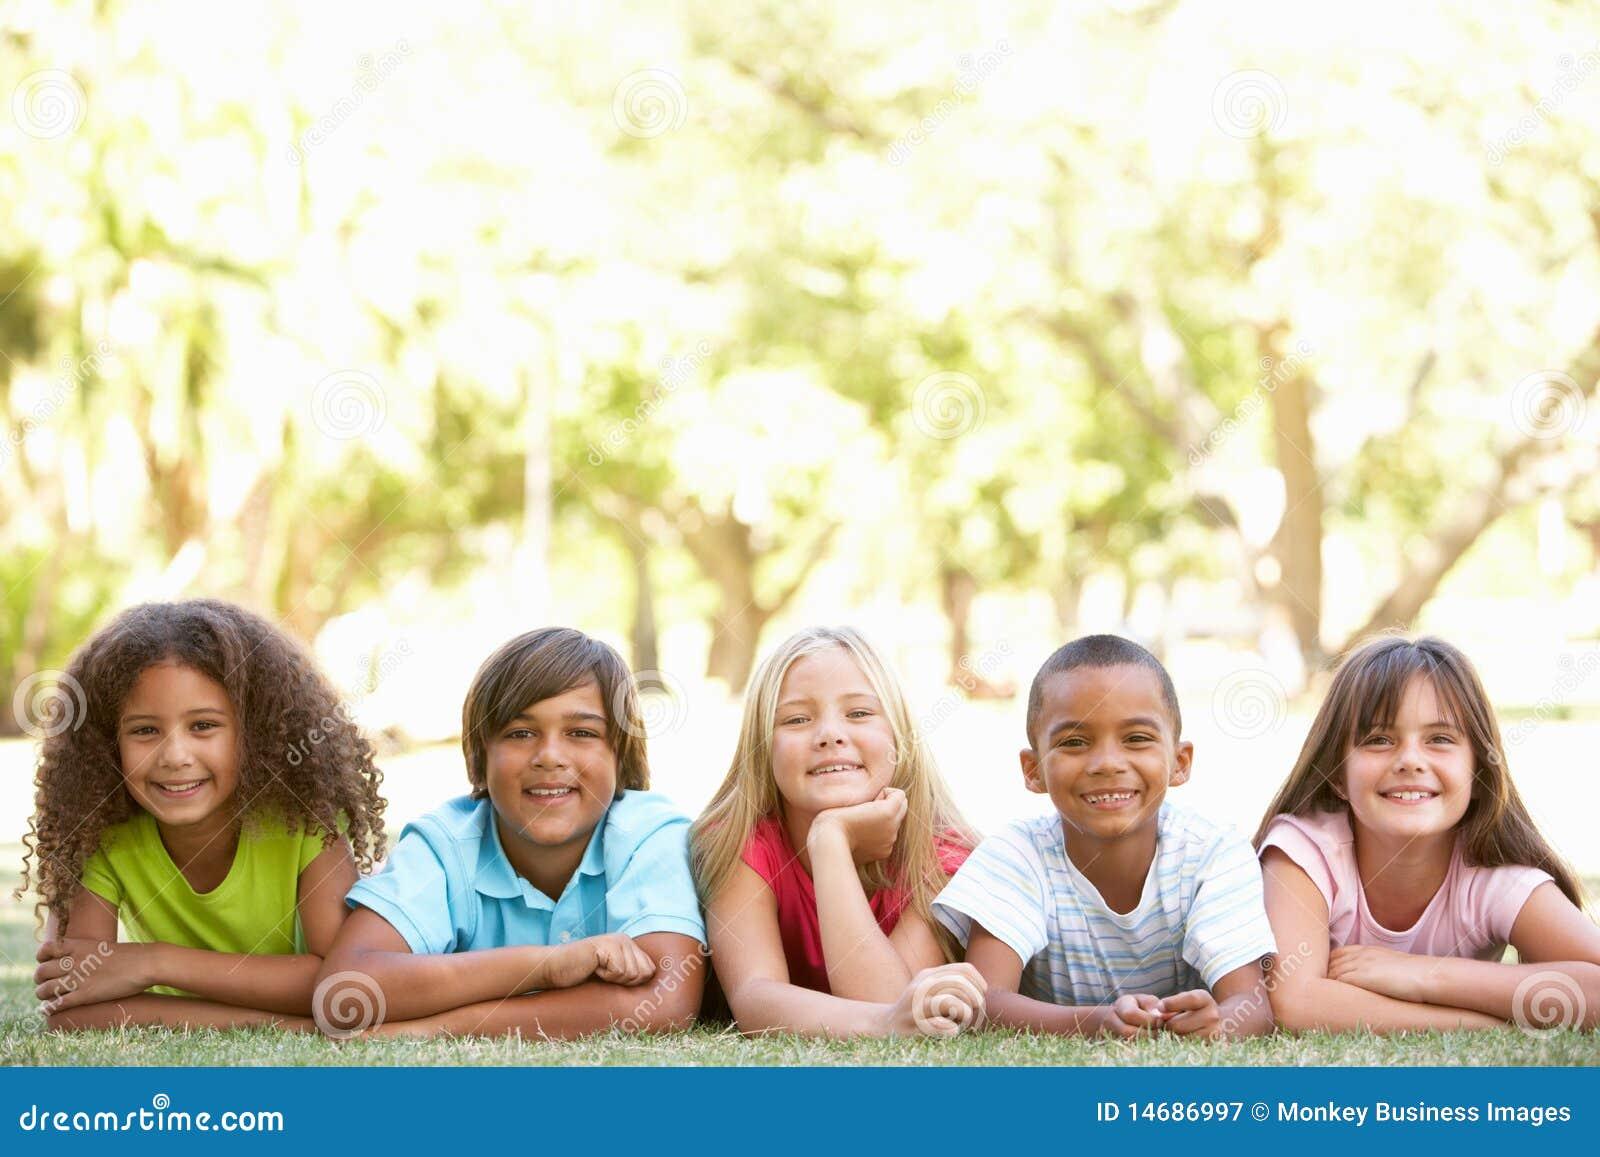 дети собирают лежа животы парка